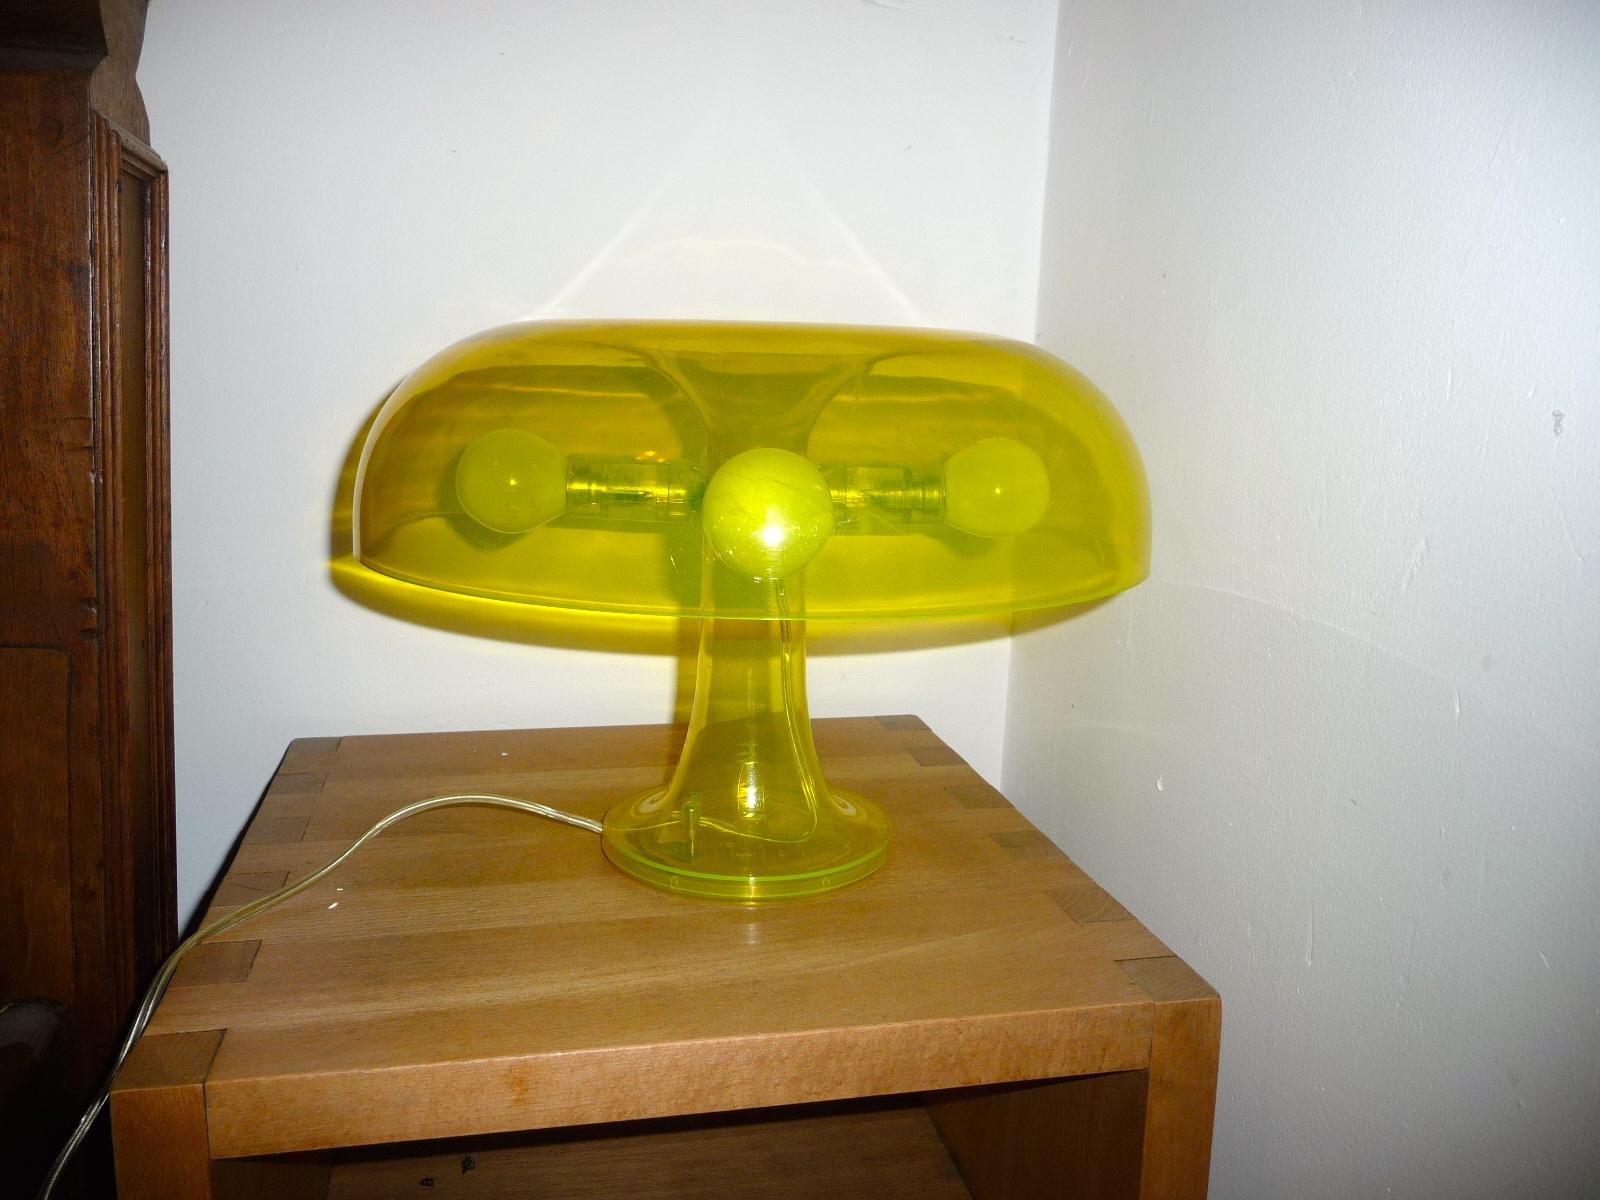 lampe table artemide nessino jaune transparent ebay. Black Bedroom Furniture Sets. Home Design Ideas